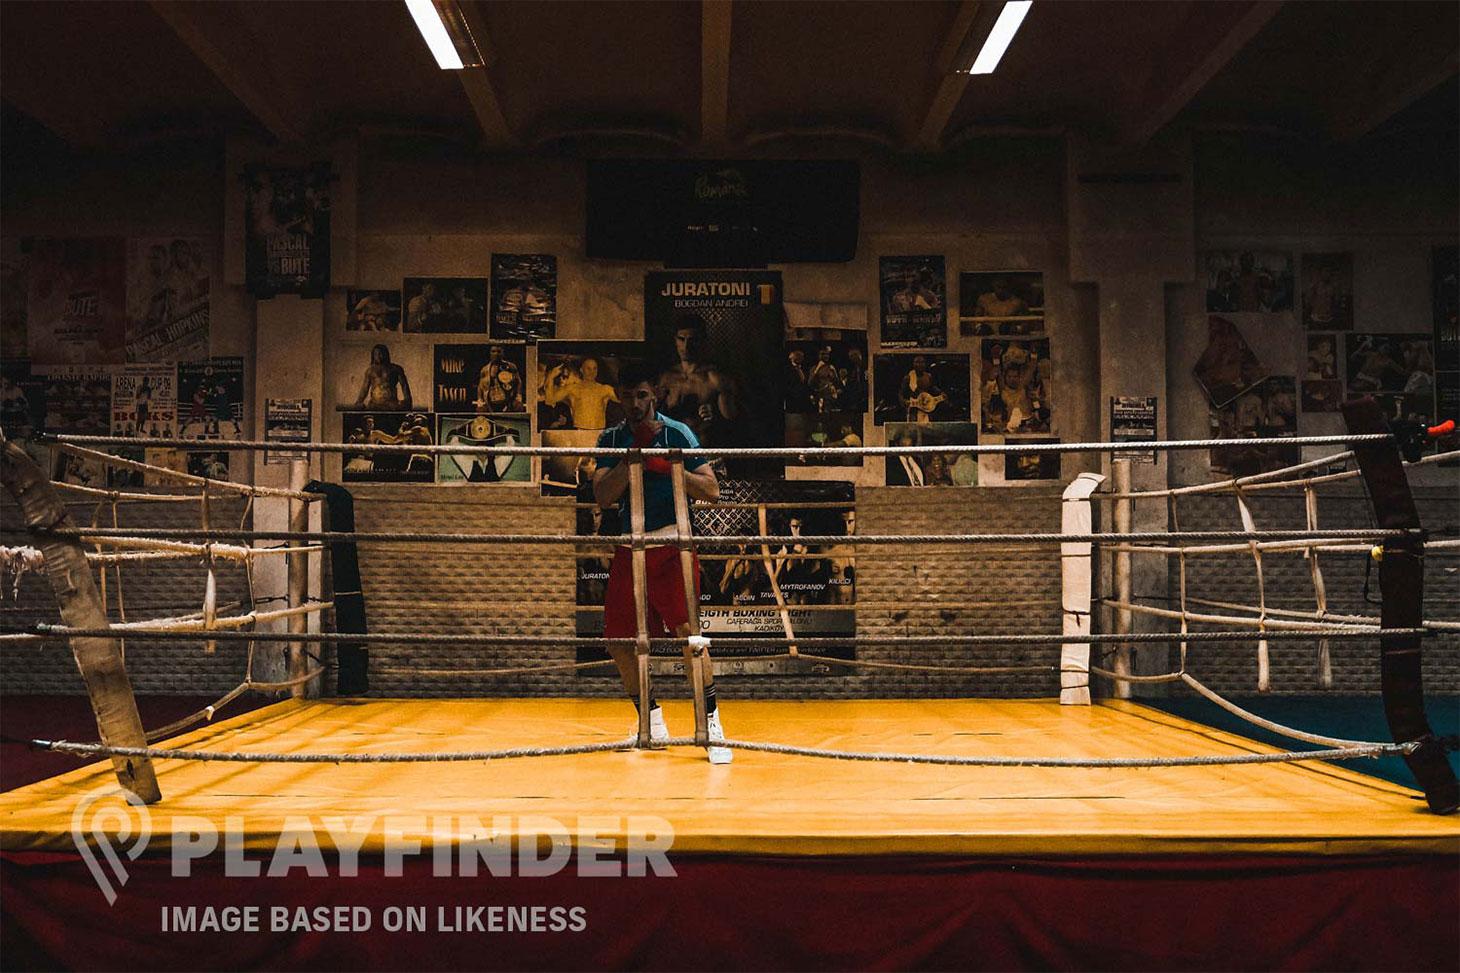 Leyton Sports Ground Boxing gym | Hard gym